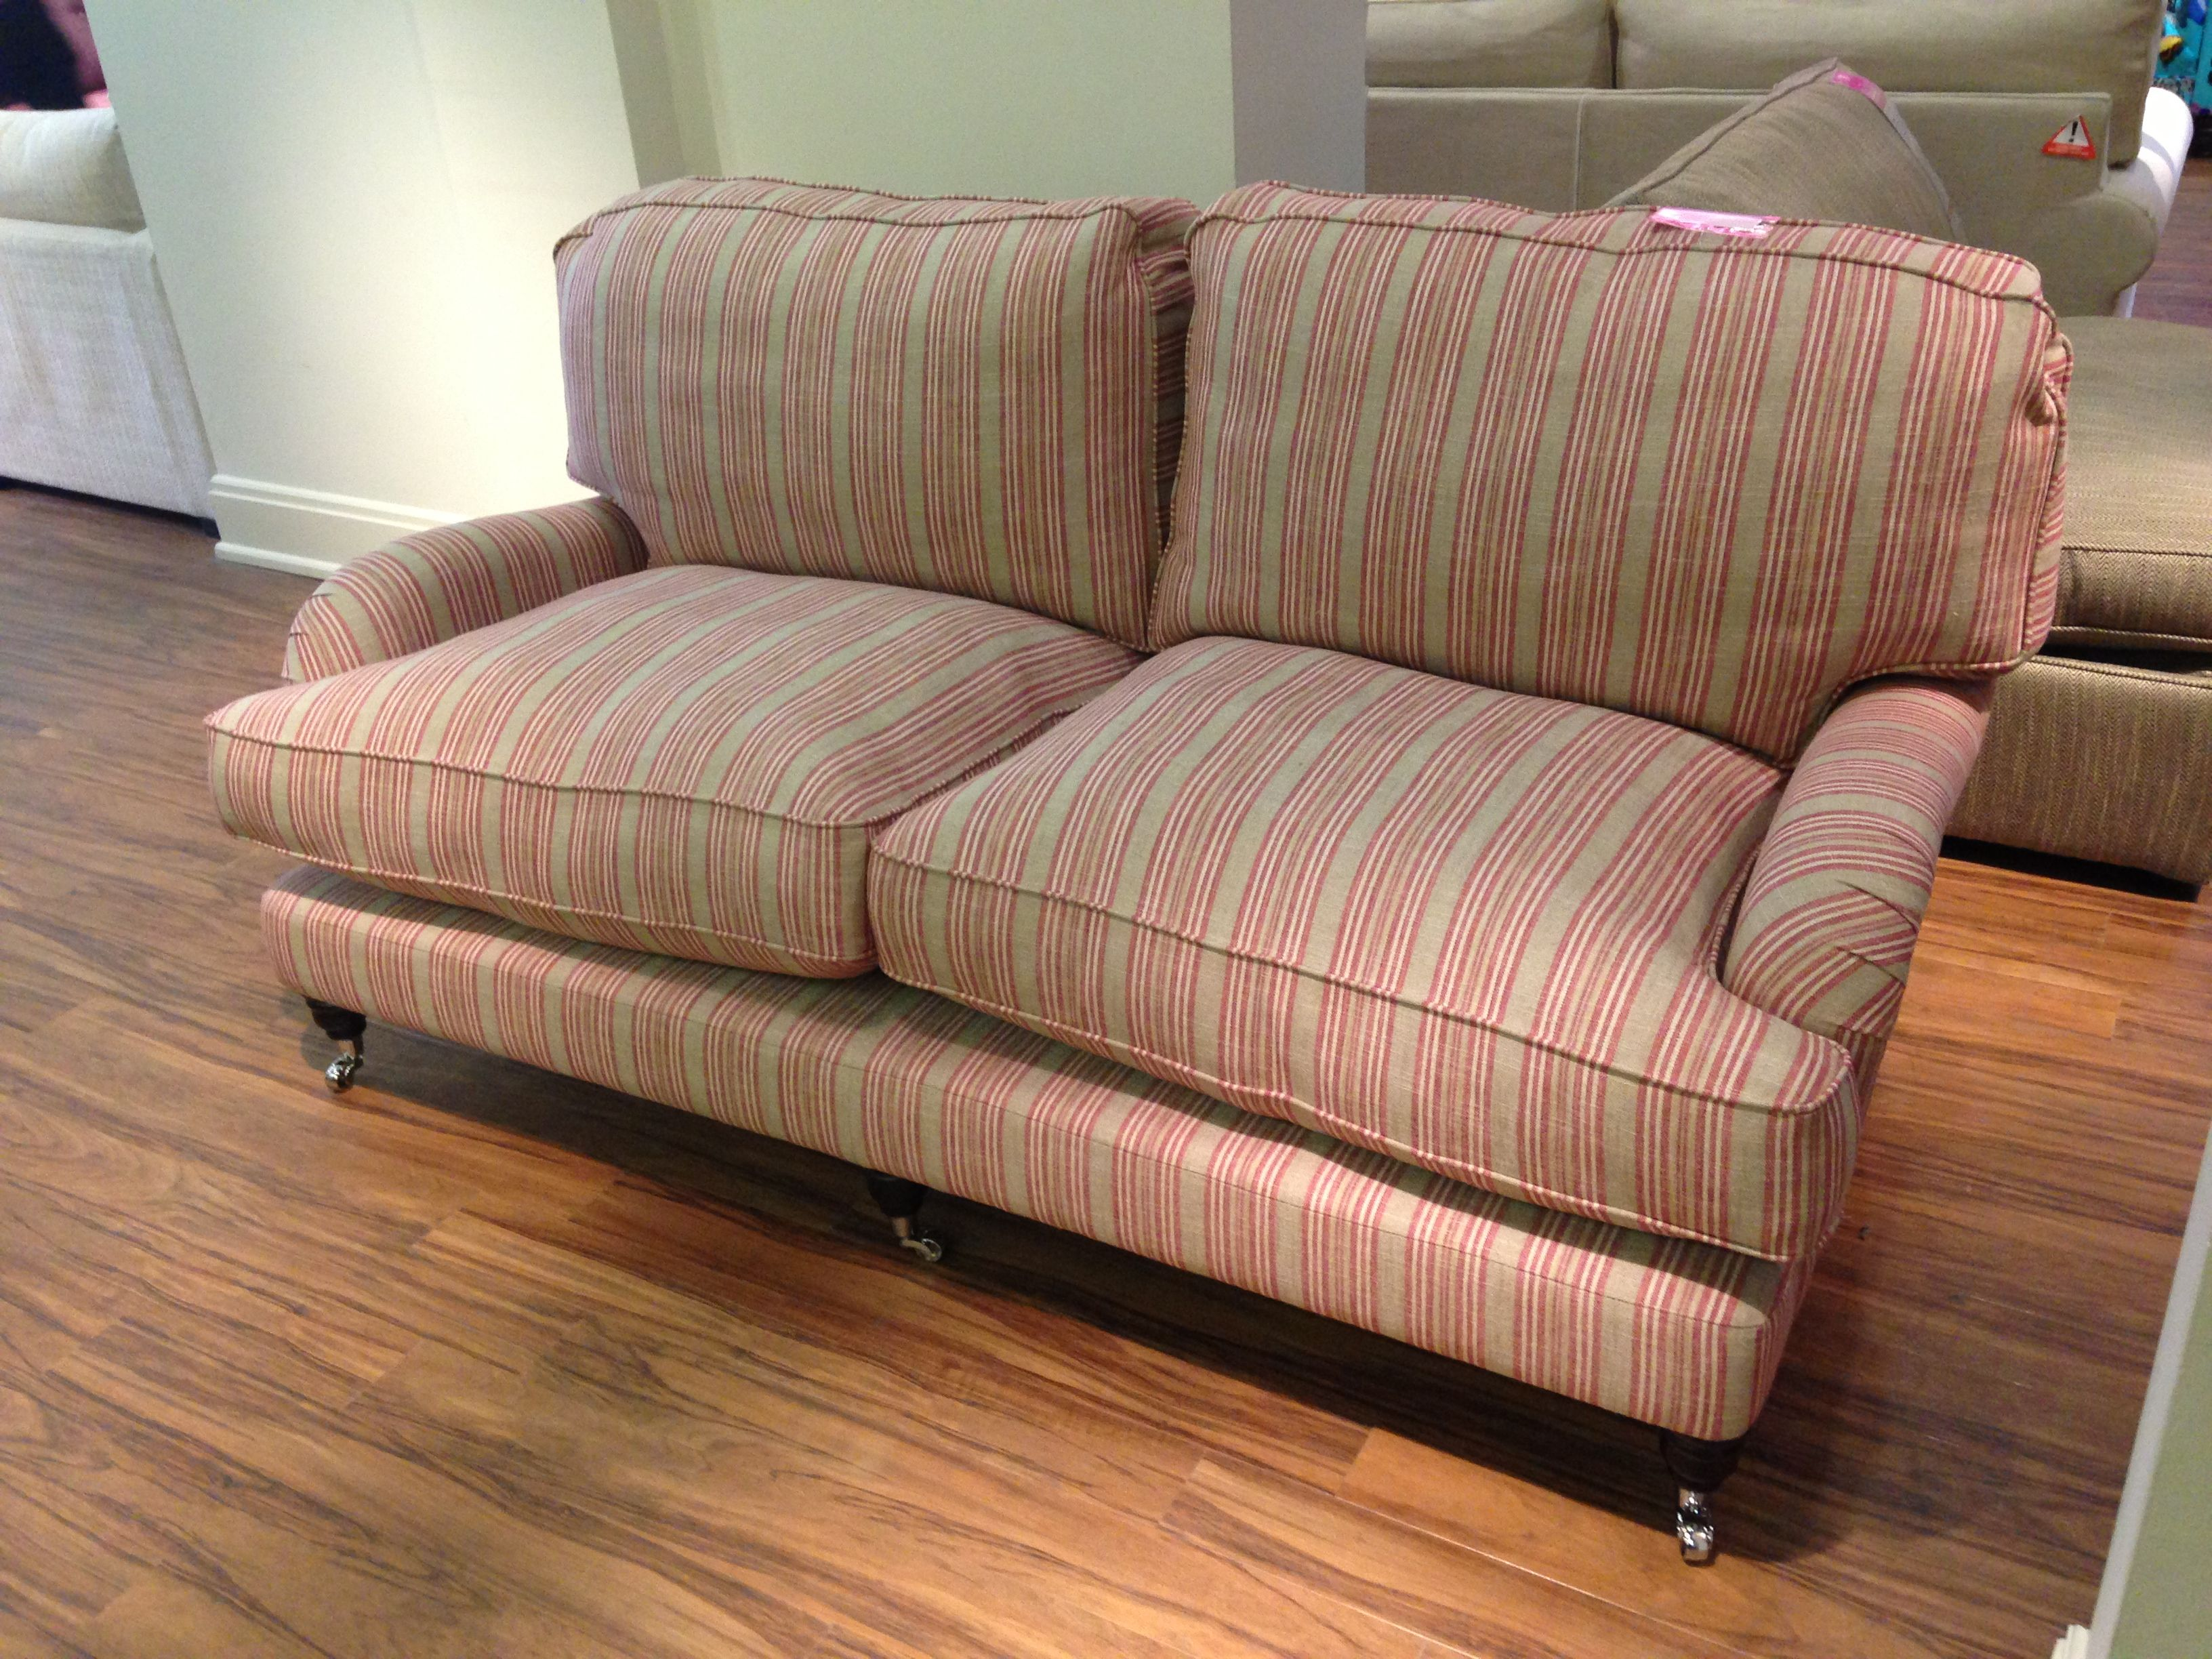 Miss Clementine 3 seater sofa in Ian Mankin Jura Stripe